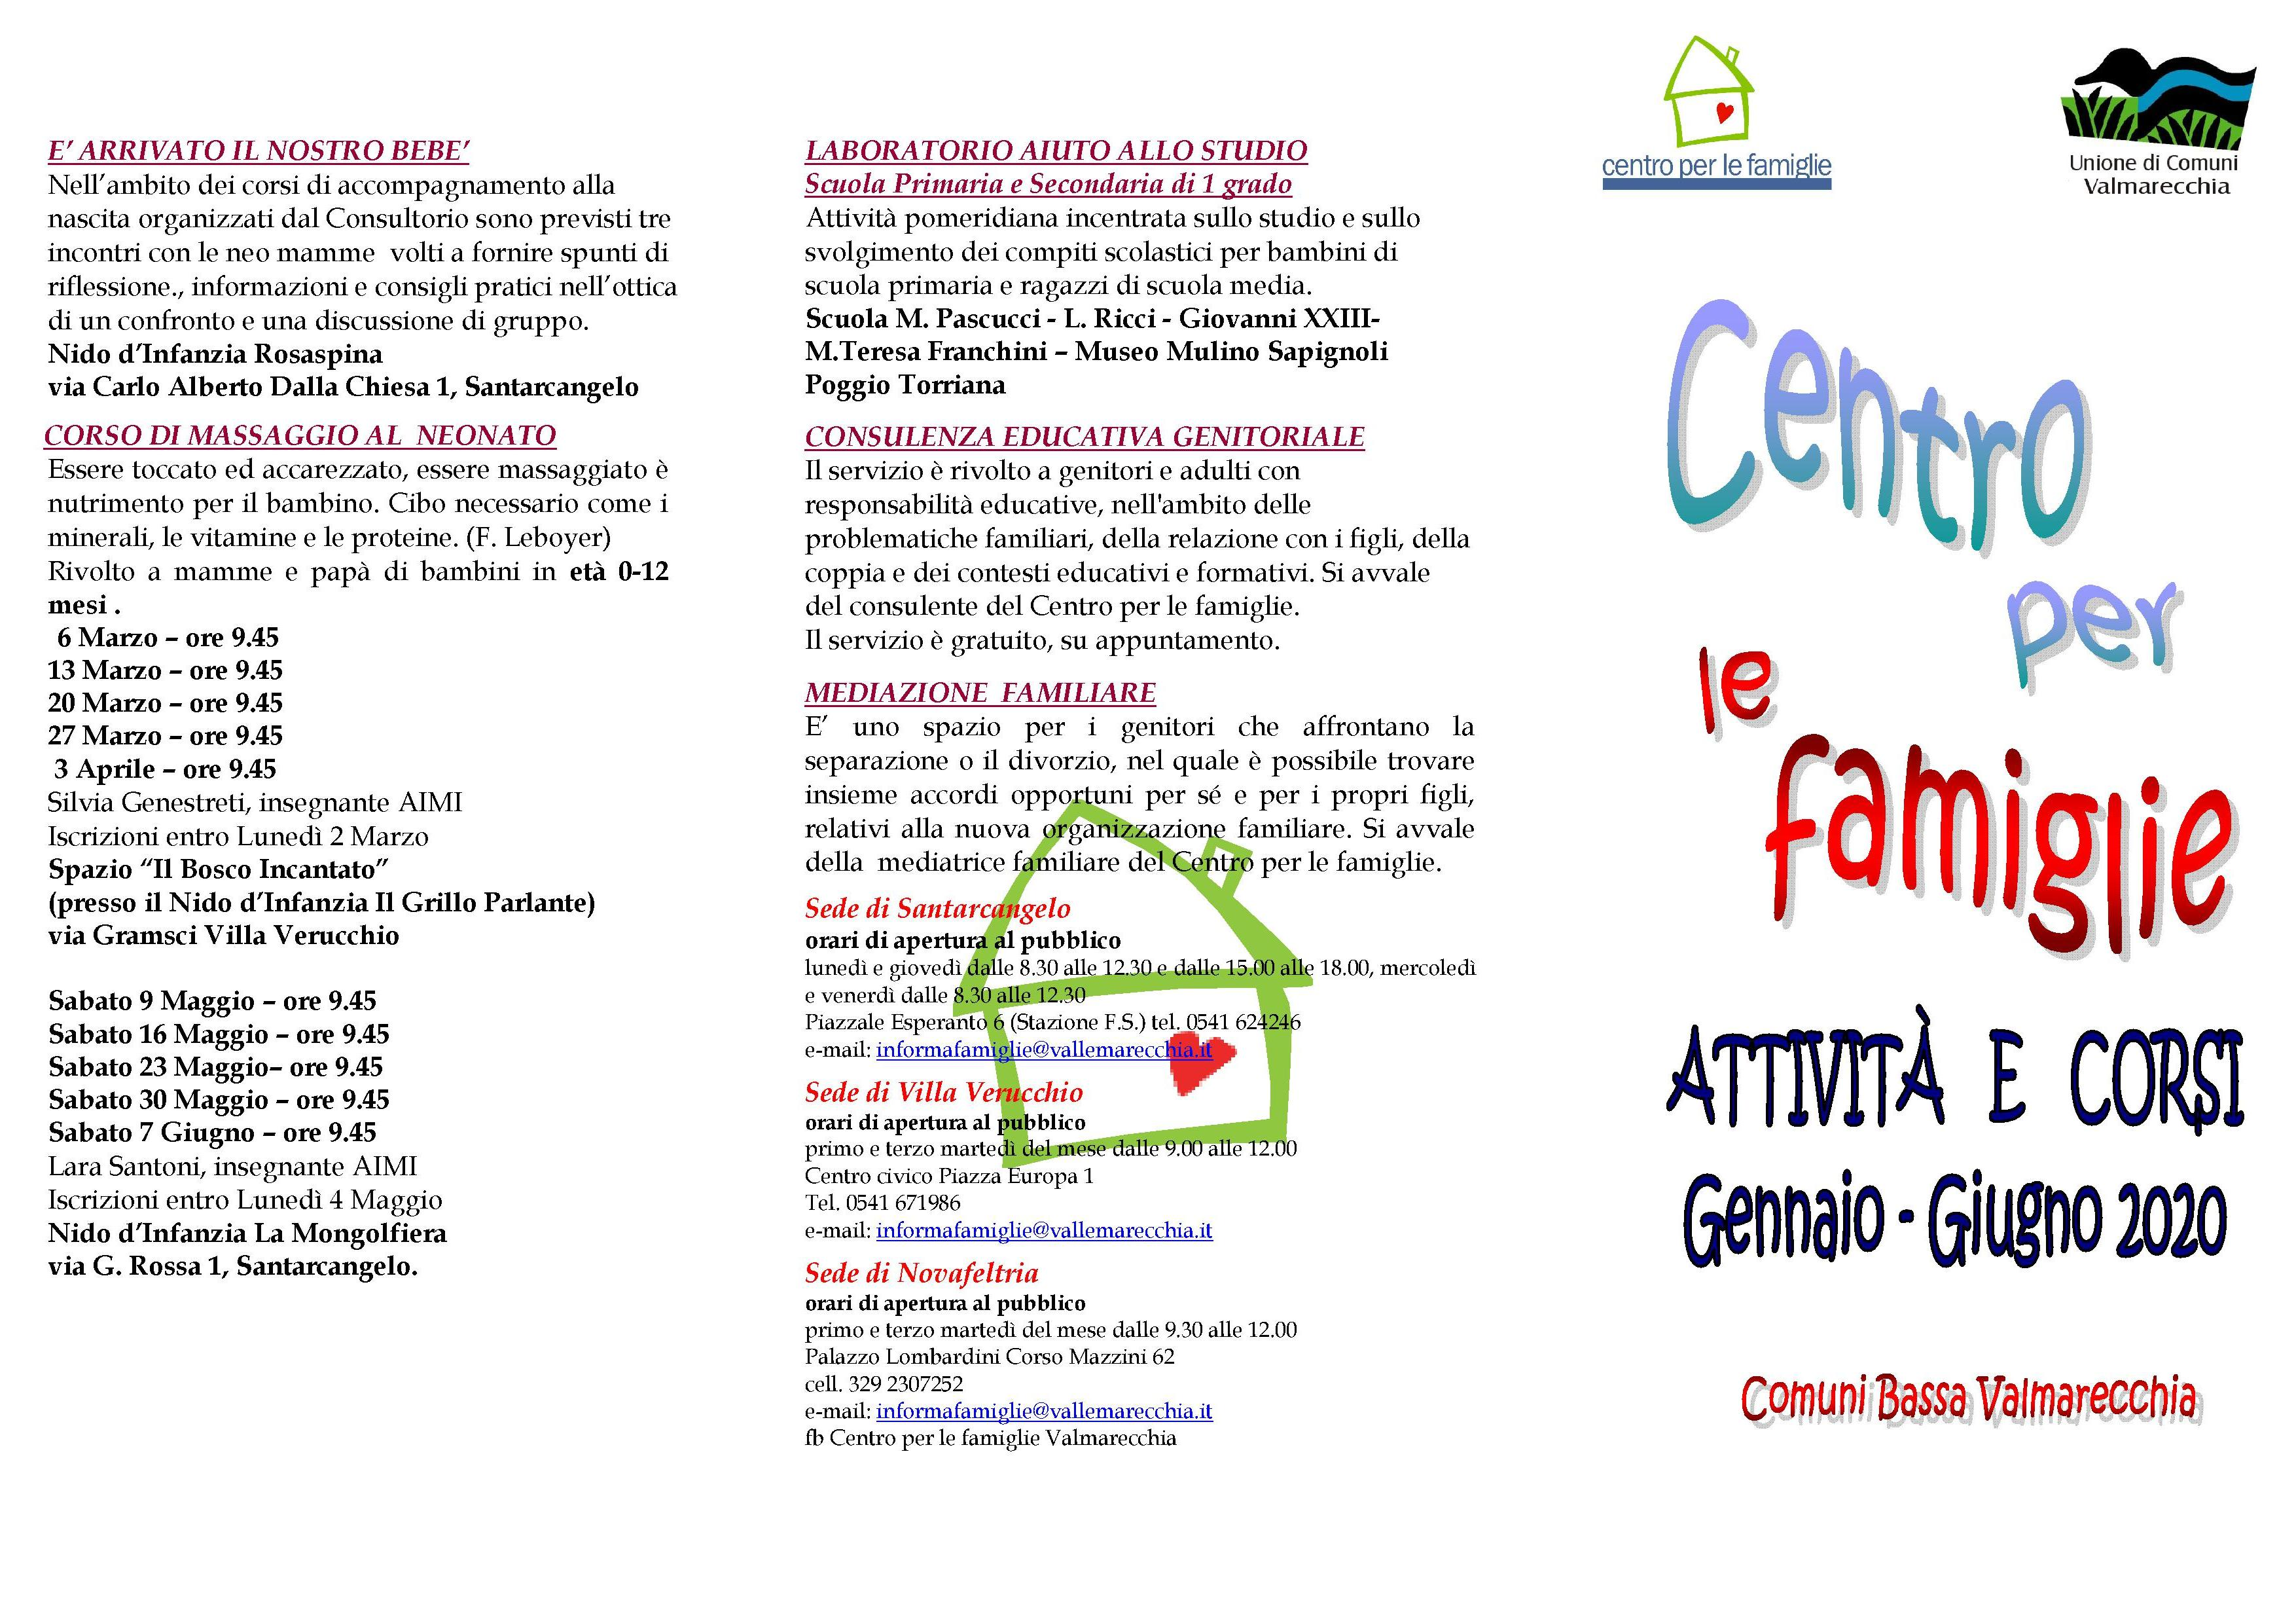 Microsoft Word - Pieghevole Bassa Valle.doc0001.jpeg